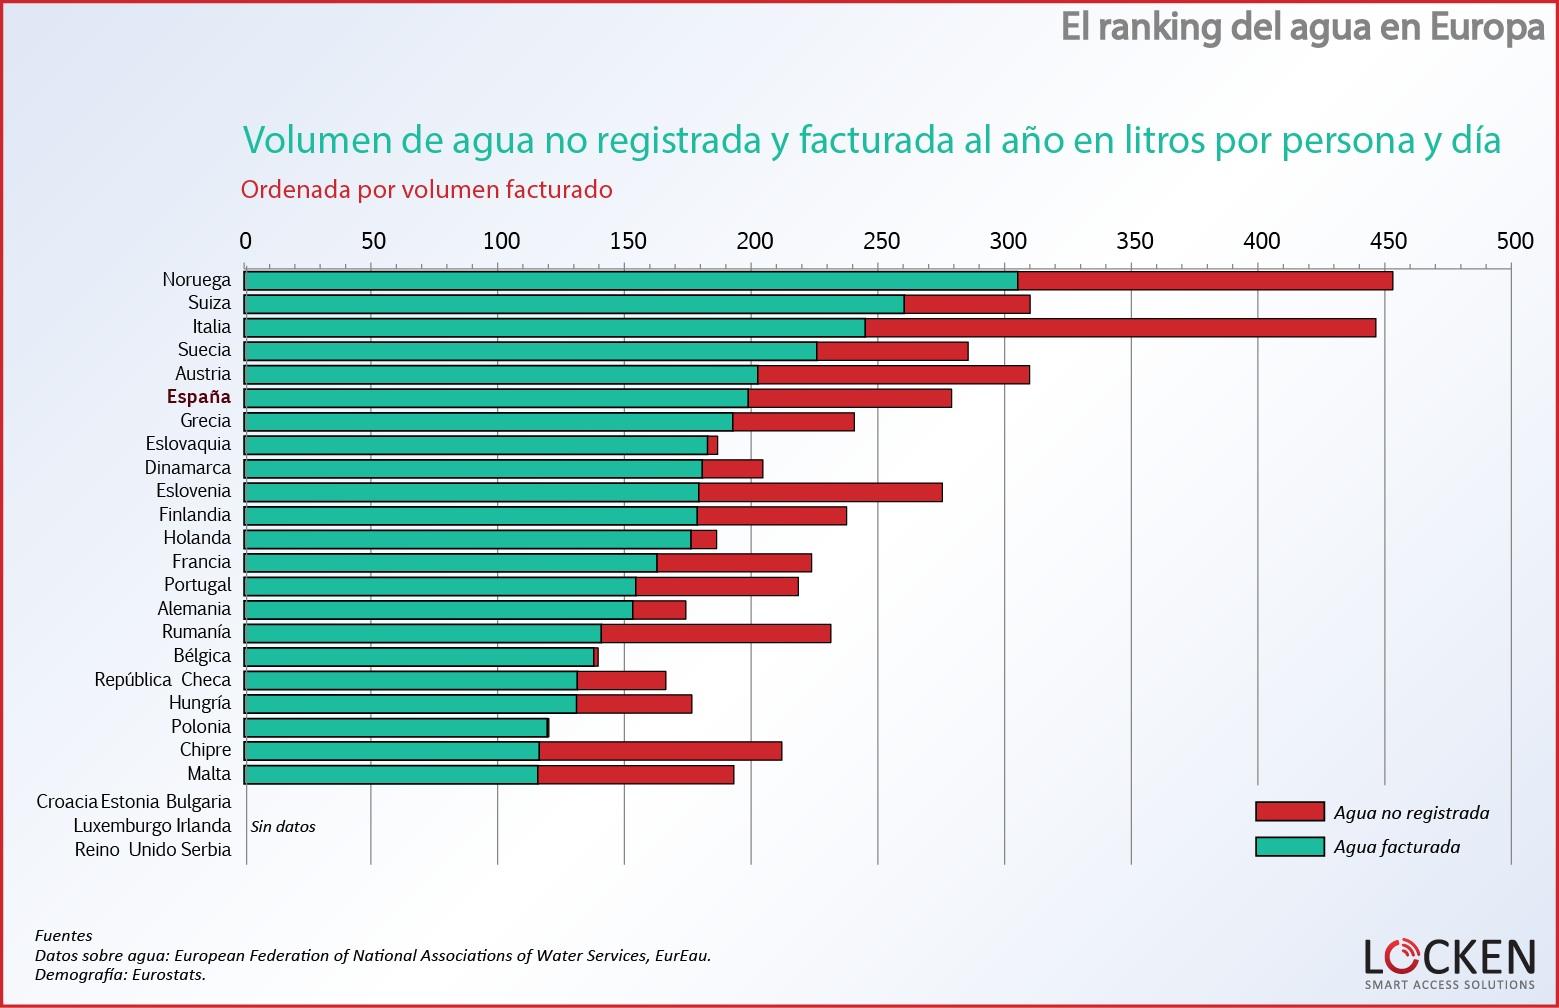 ranking-agua-europa-volumen-noregistrado-facturado-por-persona-por-volumen-no-registrado